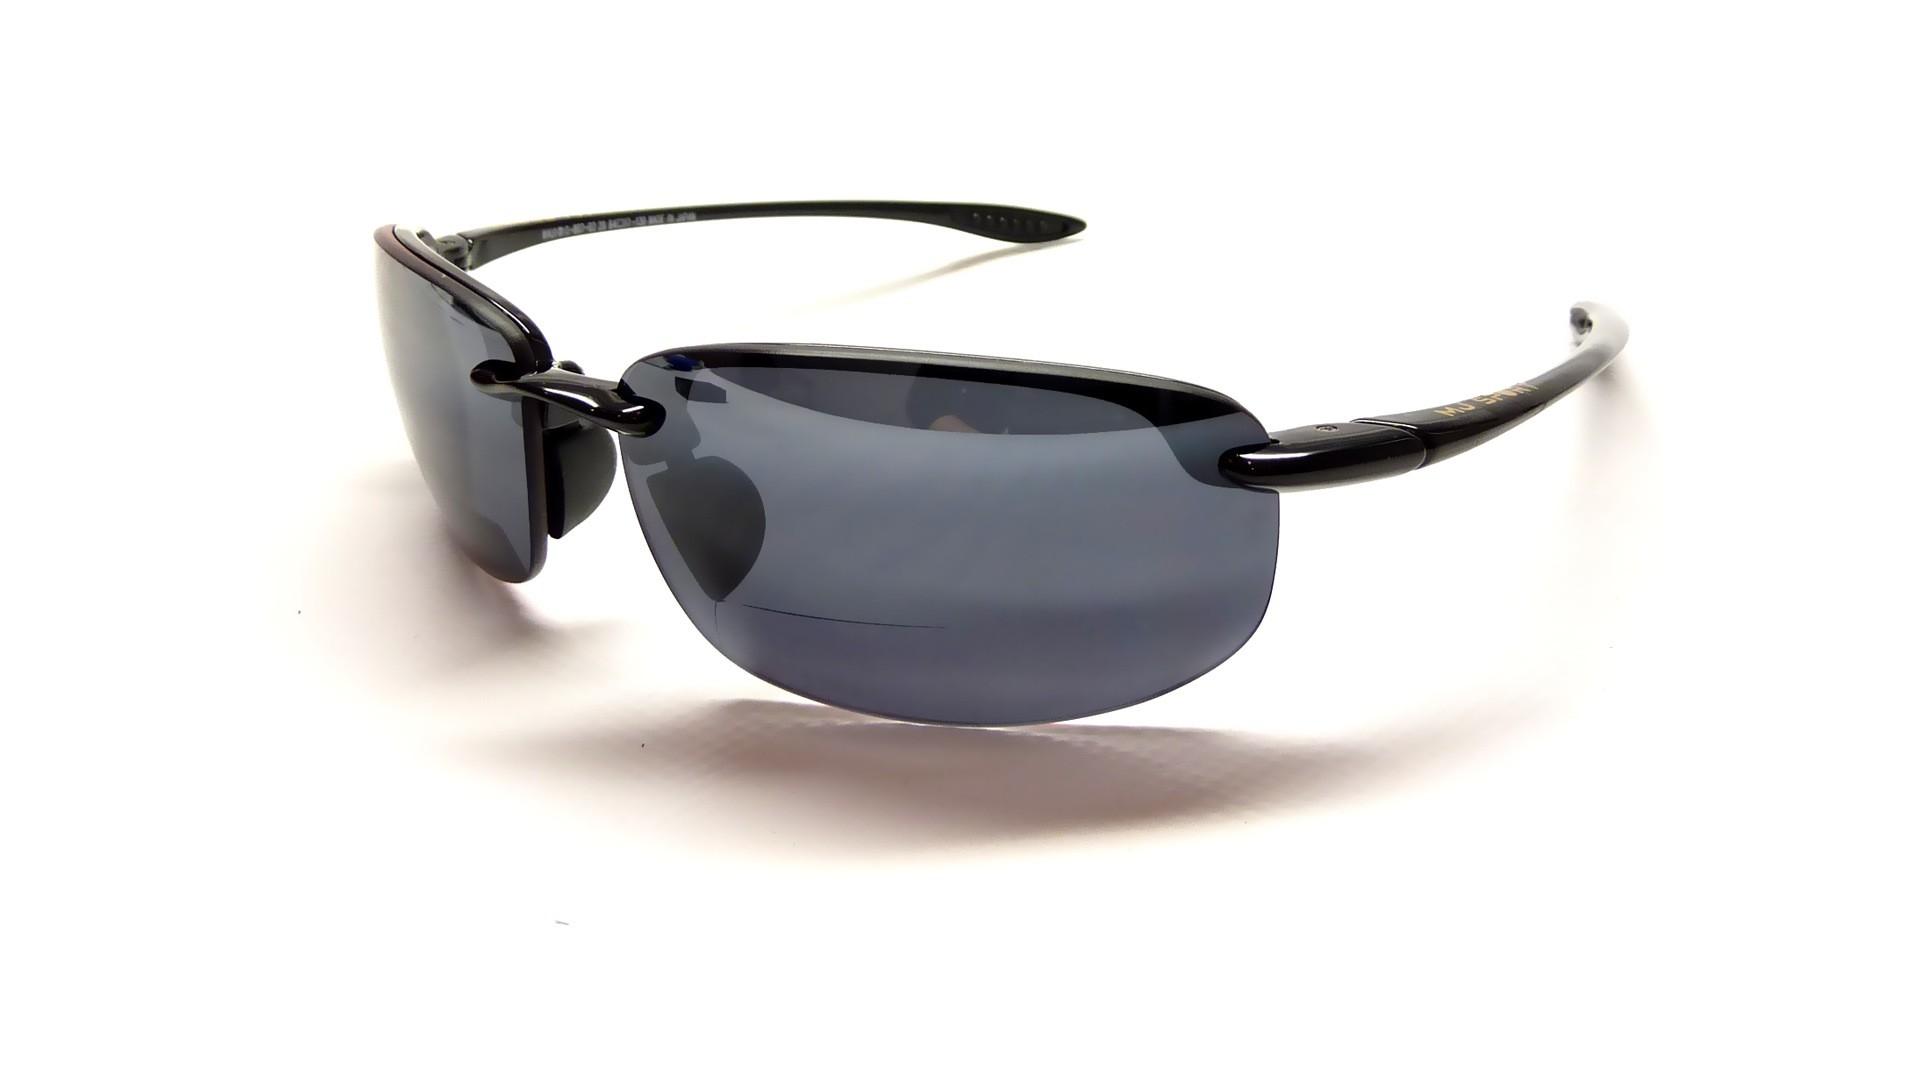 e759a6b710b9fe Sunglasses Maui Jim Ho Okipa Black MauiReader G807-02 +2.0 Polarized  sunglasses